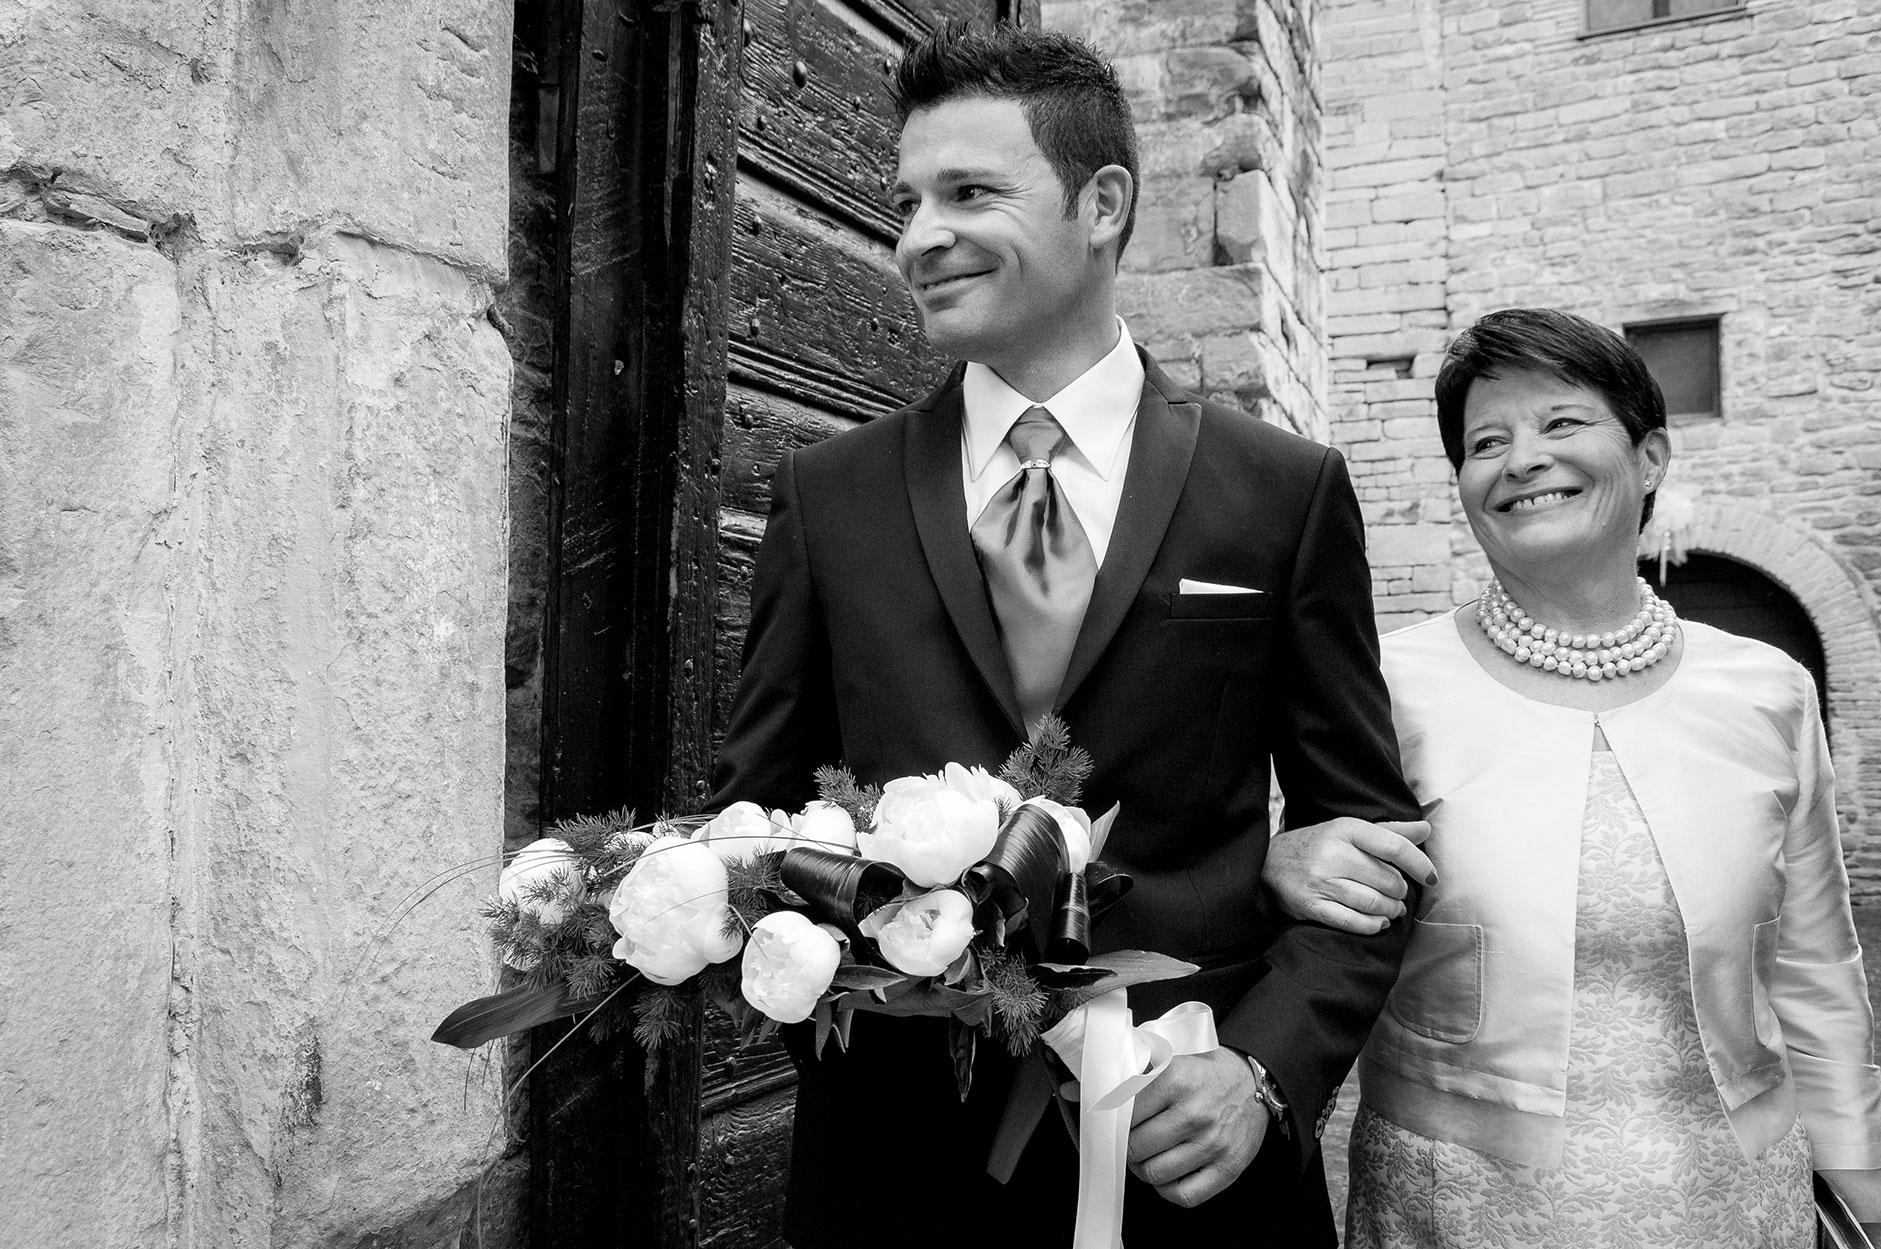 Francesca-Ferrati-wedding-photographer-Verona-Federica-Giovanni7